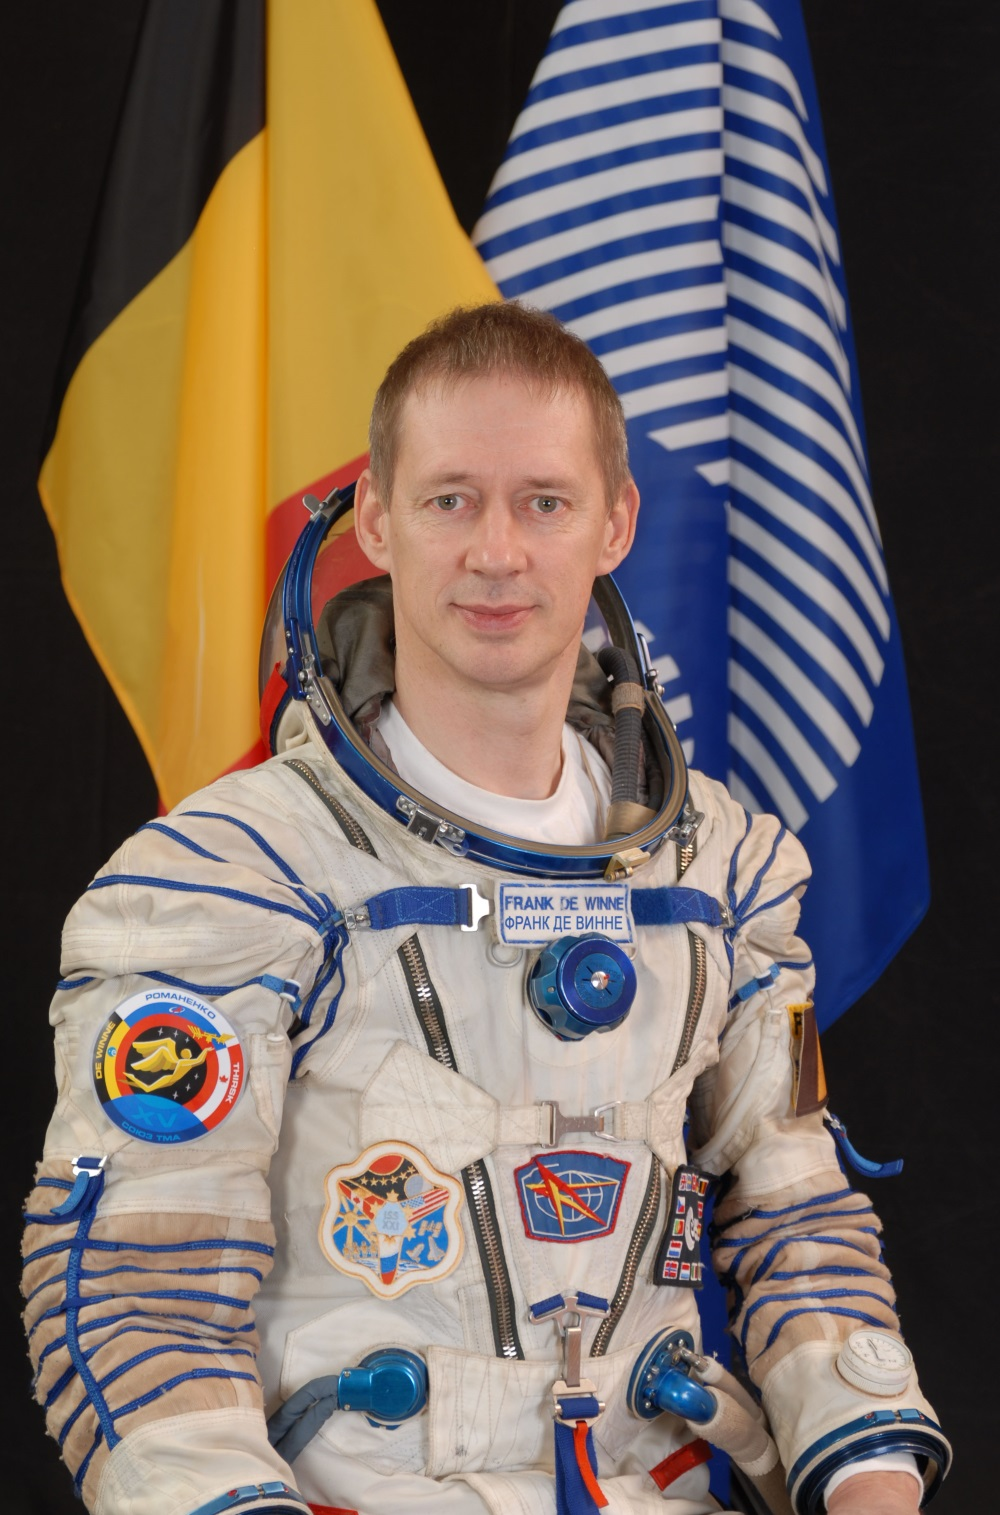 Speyer belgischer astronaut frank de winne besucht for Frank westheim